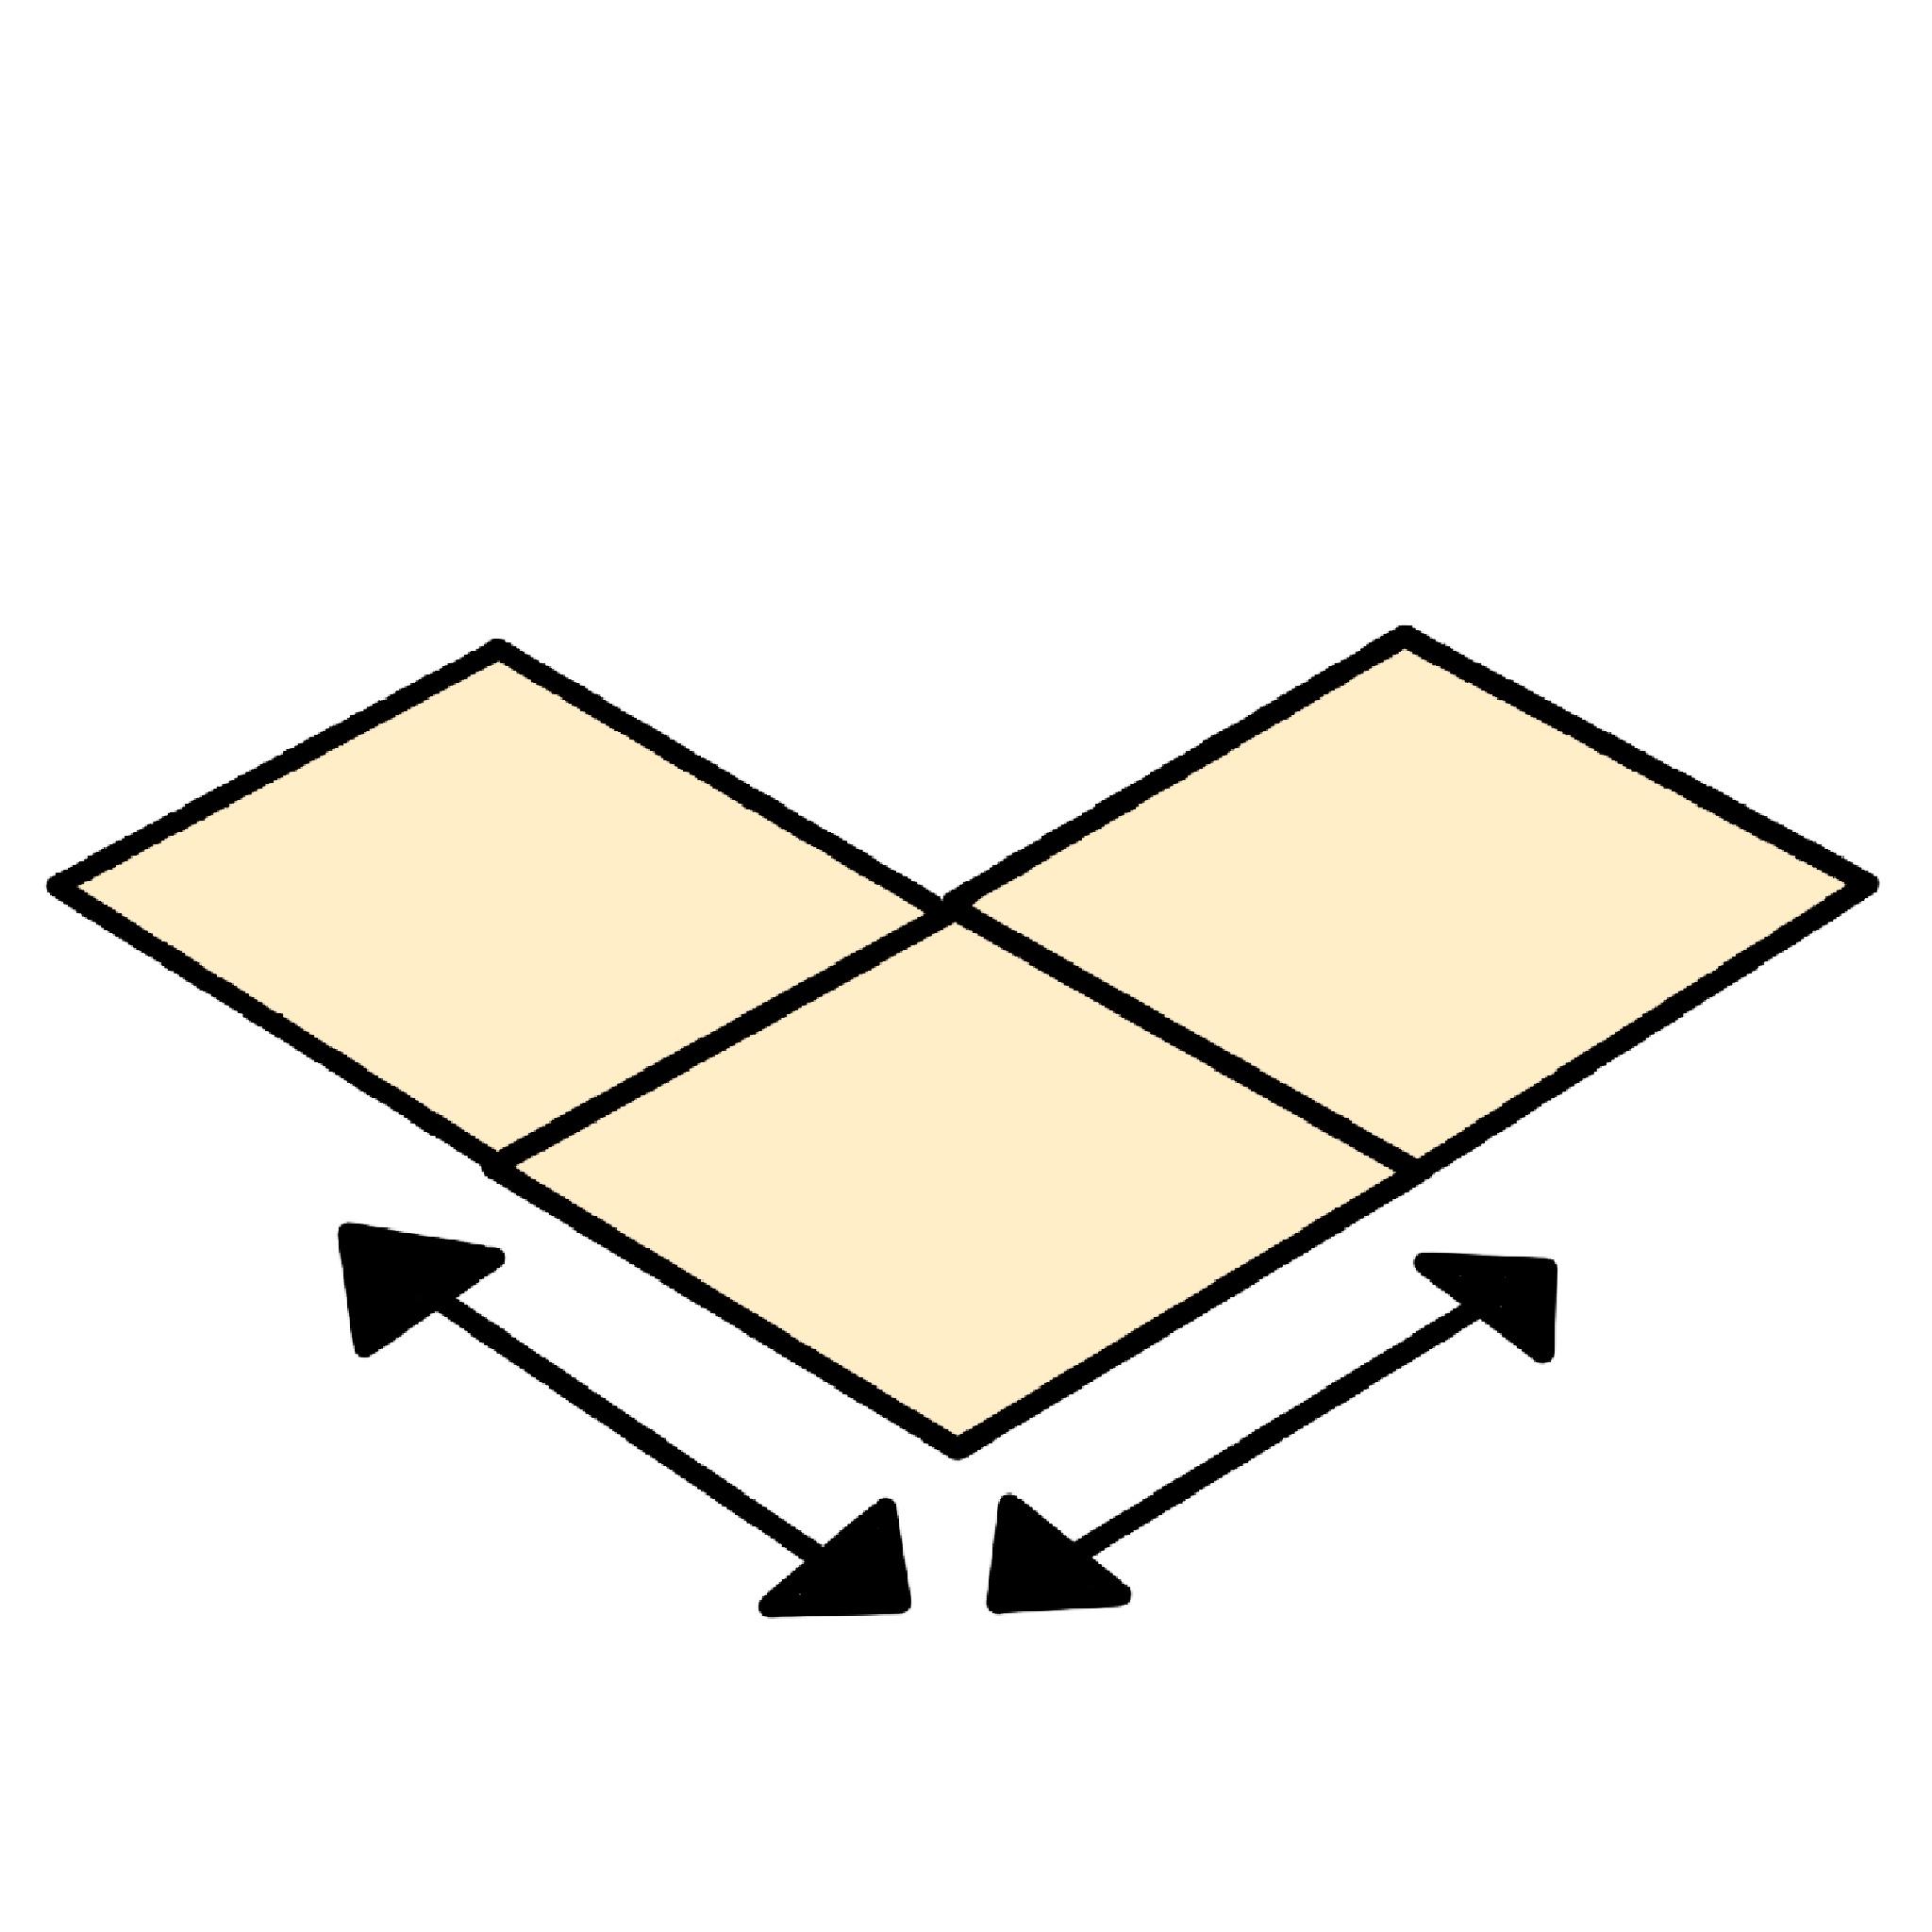 5-10 m²